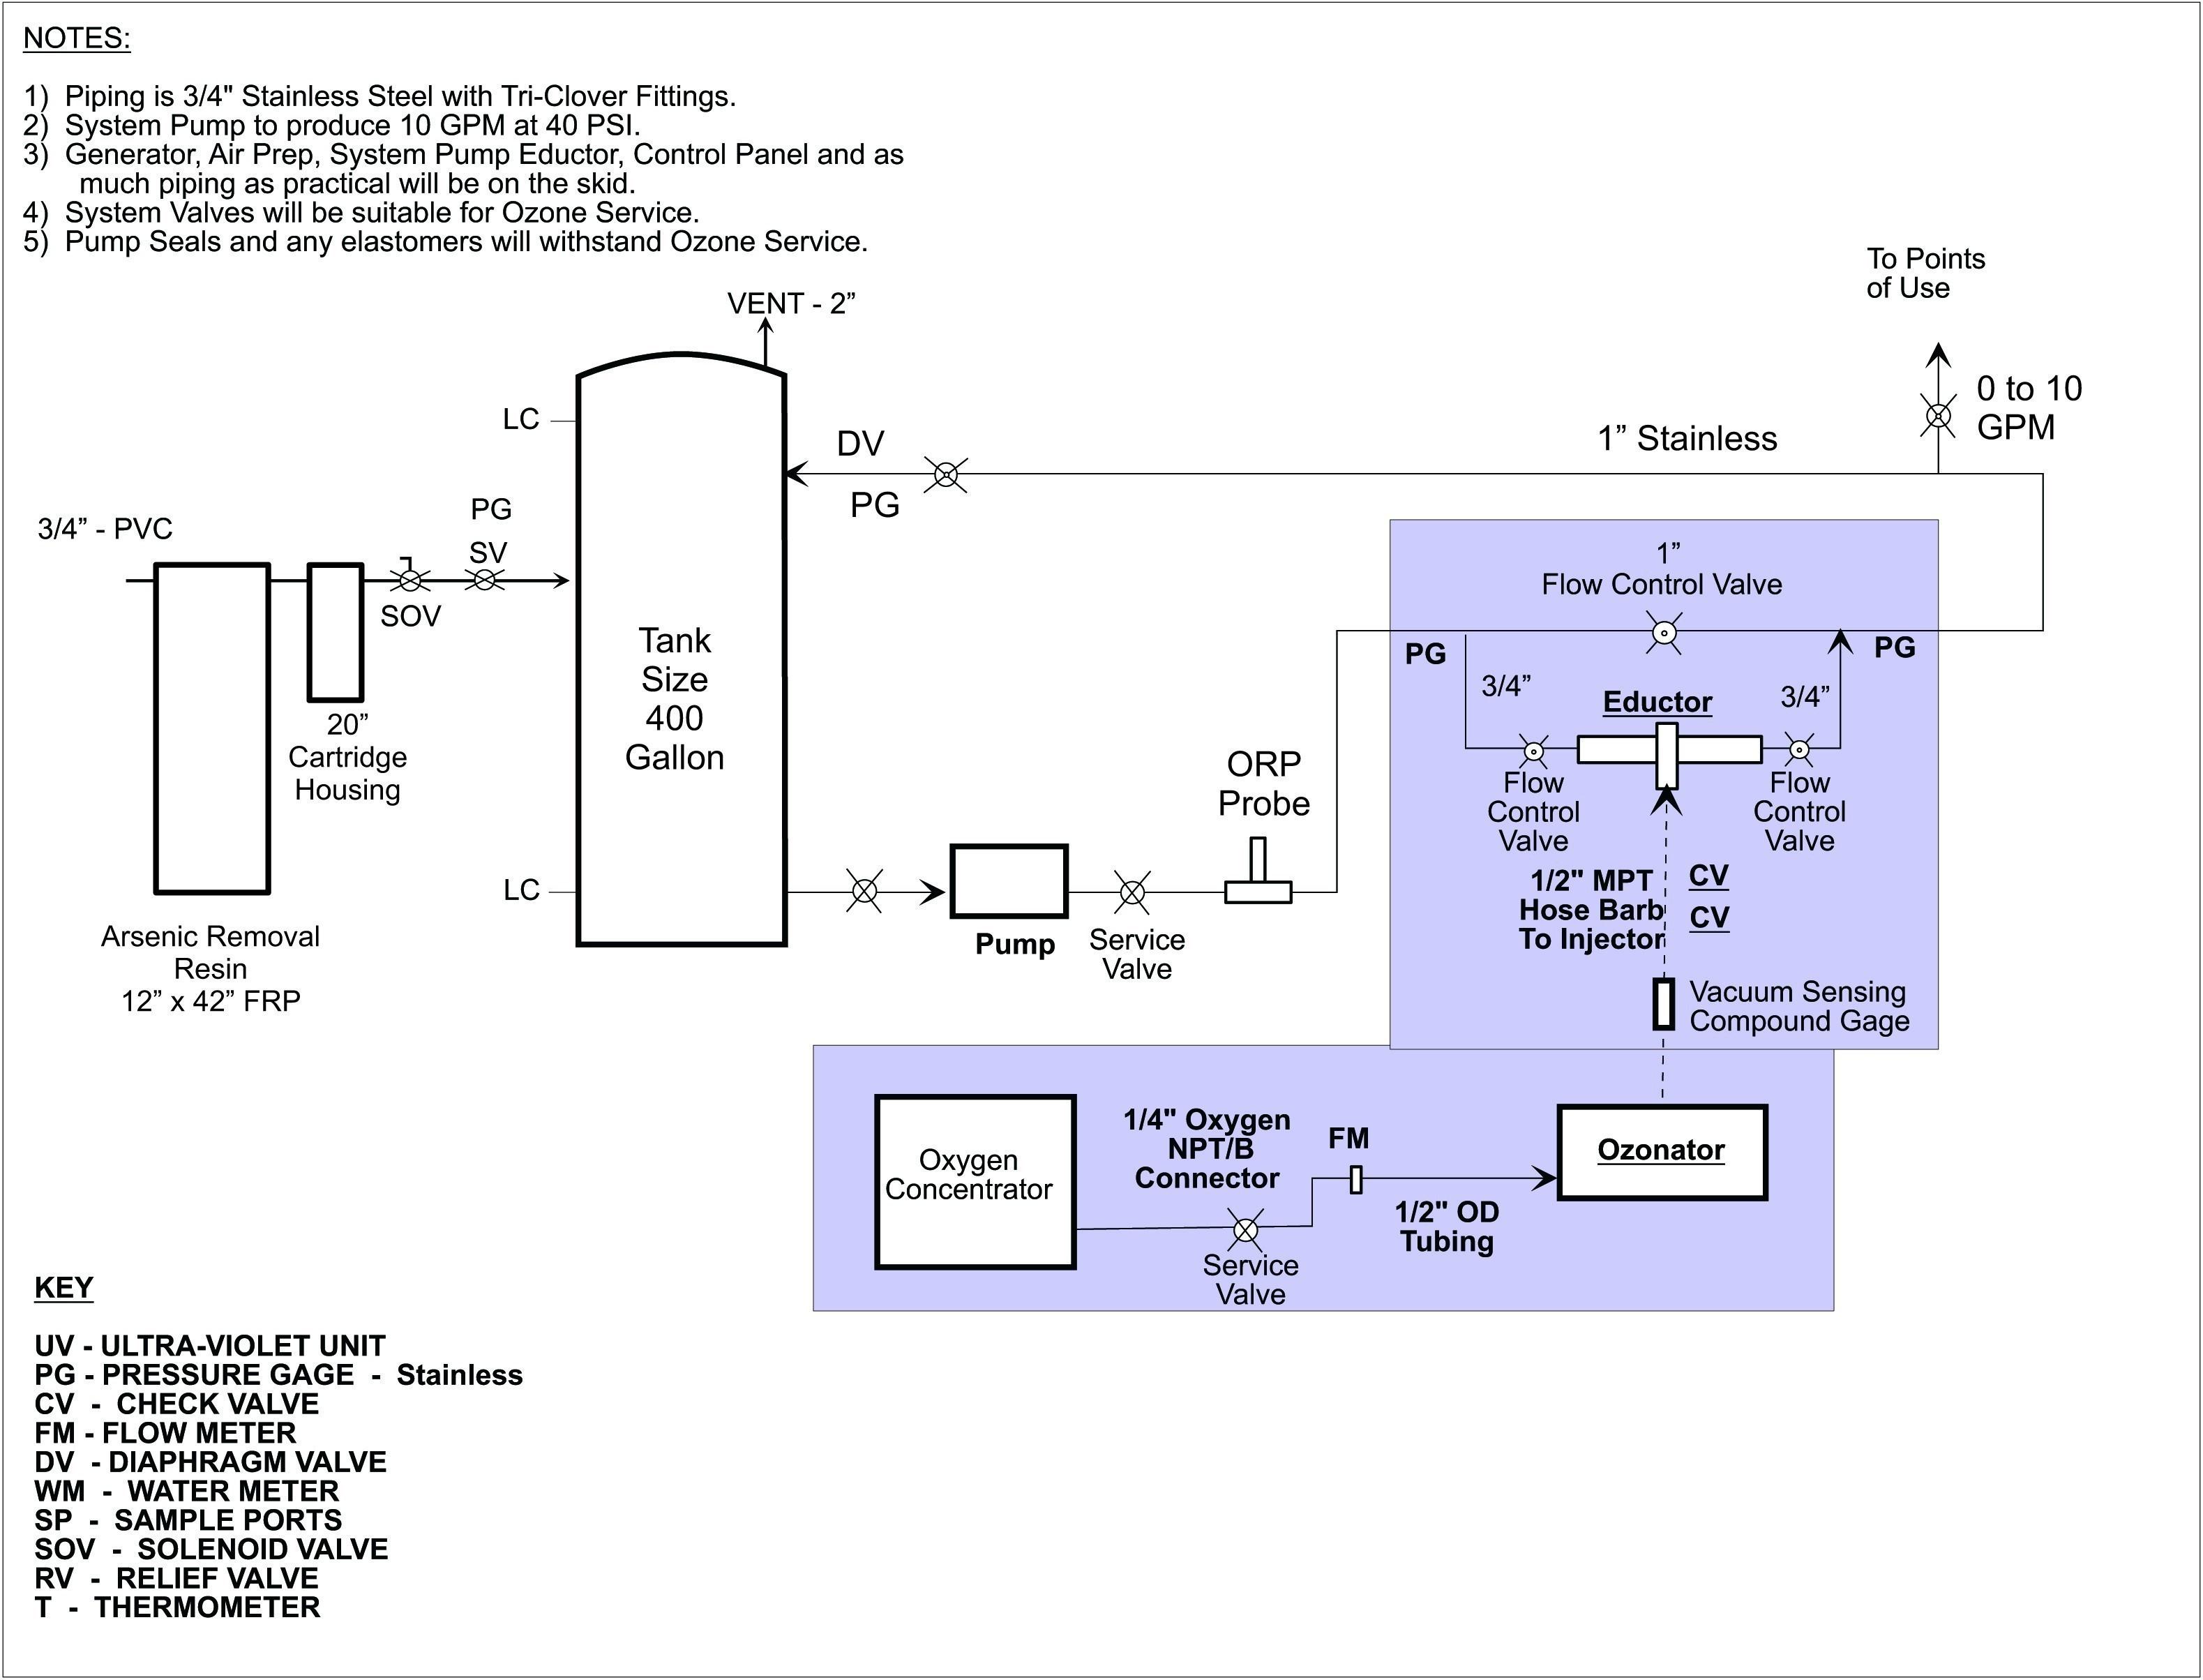 Boat Trailer Wiring Diagram 4 Way Boat Trailer Wiring Diagram 4 Plug Of Boat Trailer Wiring Diagram 4 Way